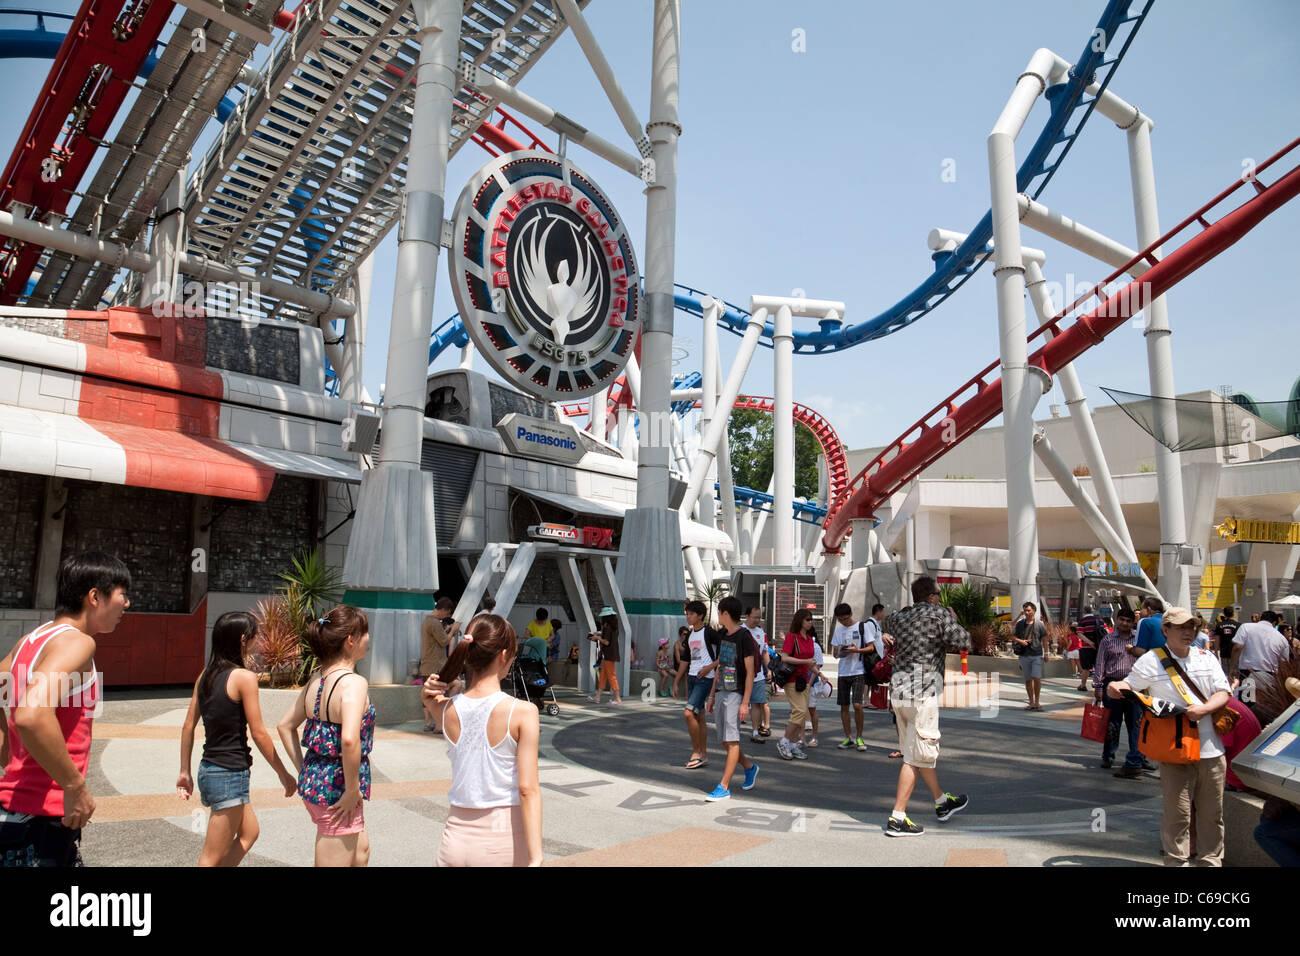 The 'Battlestar Galactica' roller coaster ride in Sci-Fi world, Universal Studios, Sentosa island Singapore - Stock Image